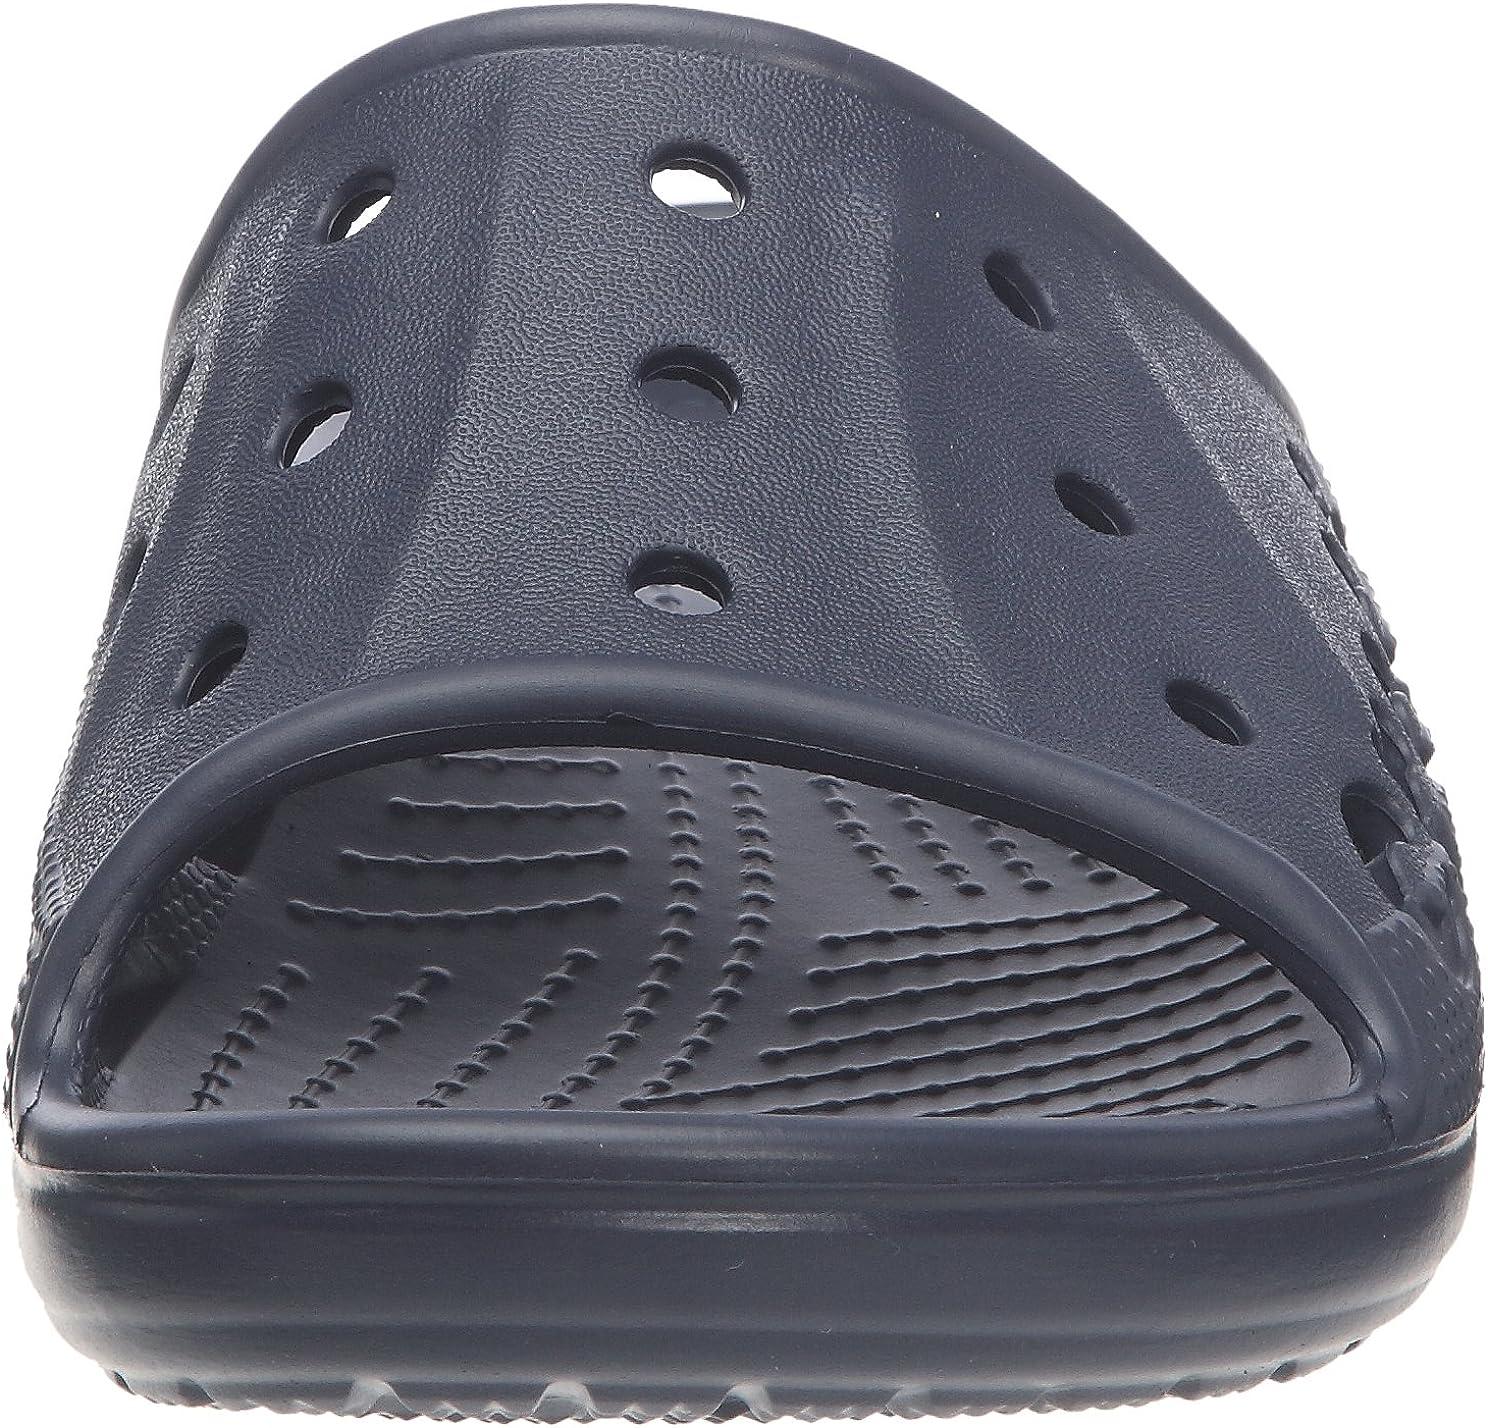 Crocs Mens 12000 Baya Slide Clog